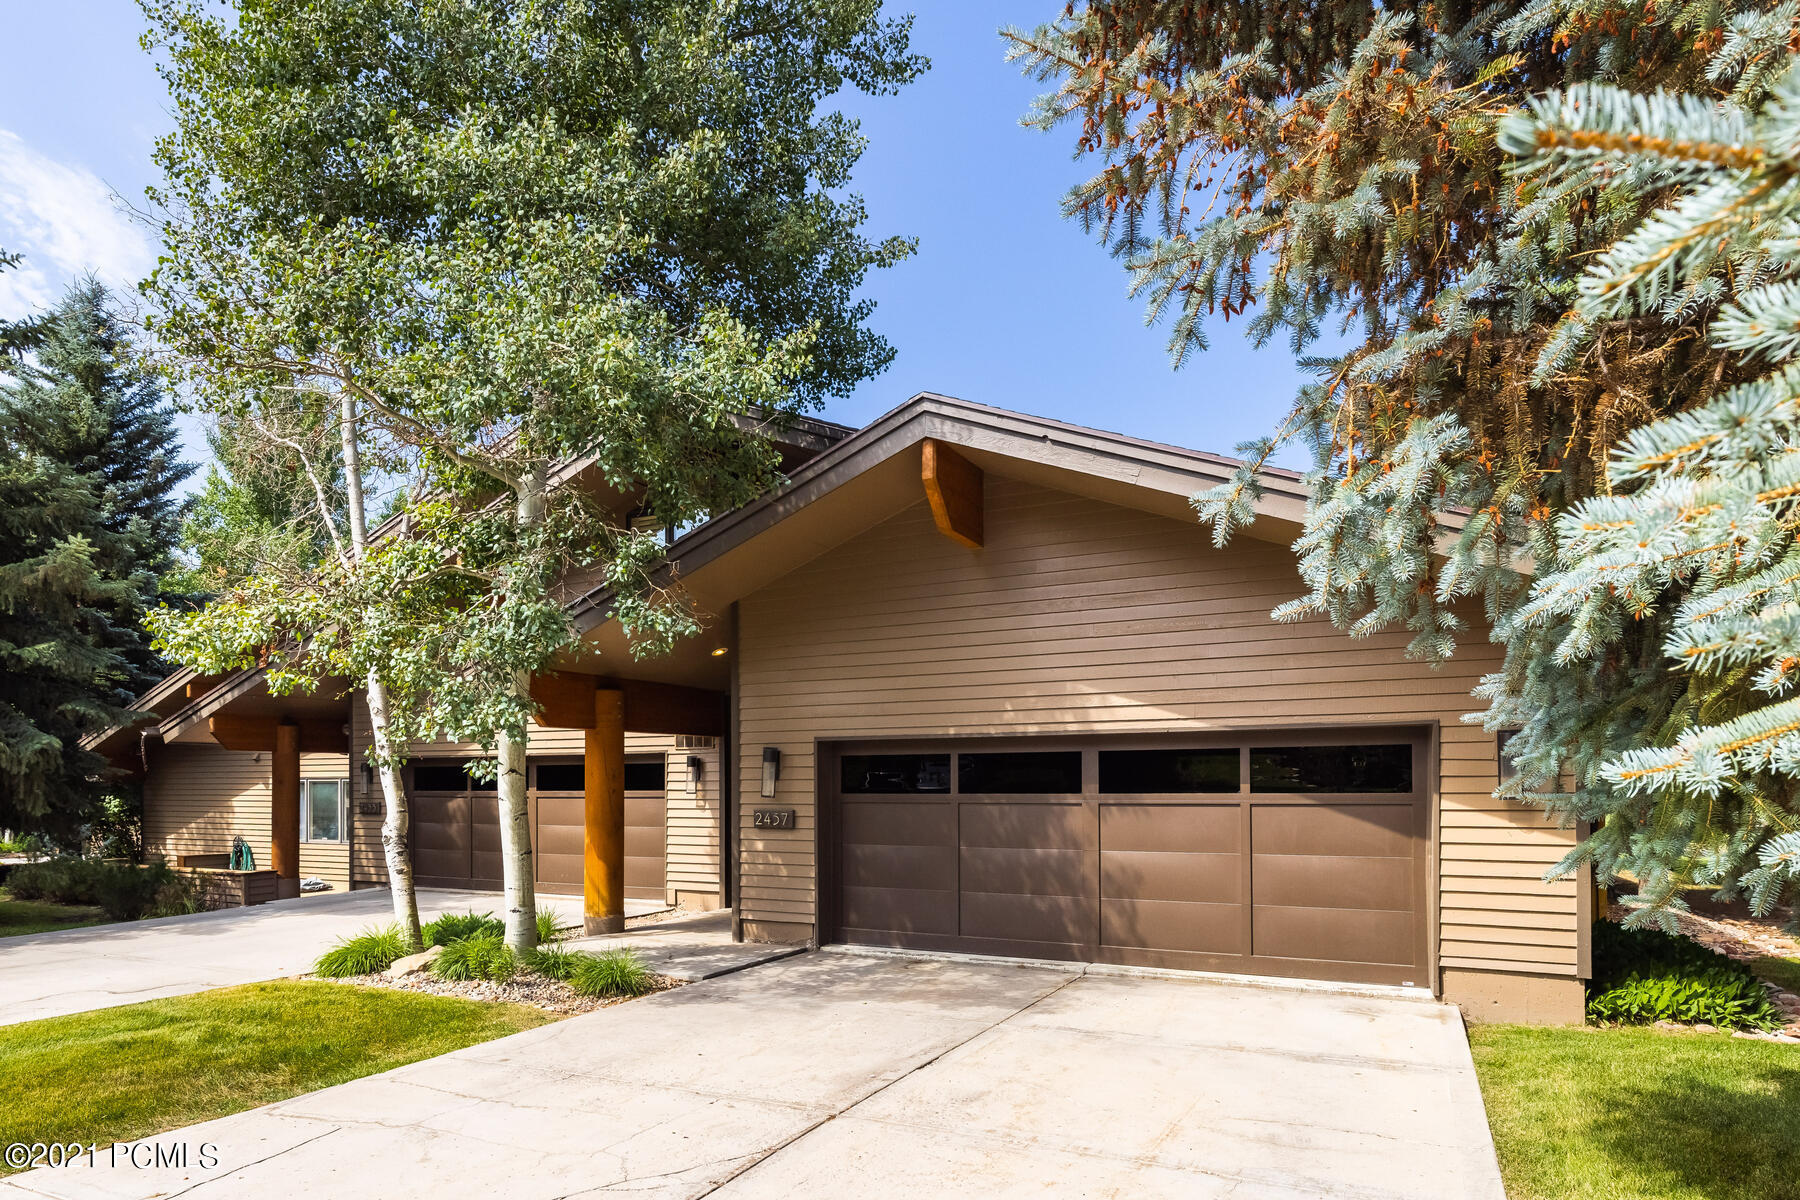 2457 Fairway Village Drive, Park City, Utah 84060, 3 Bedrooms Bedrooms, ,3 BathroomsBathrooms,Condominium,For Sale,Fairway Village,12102943